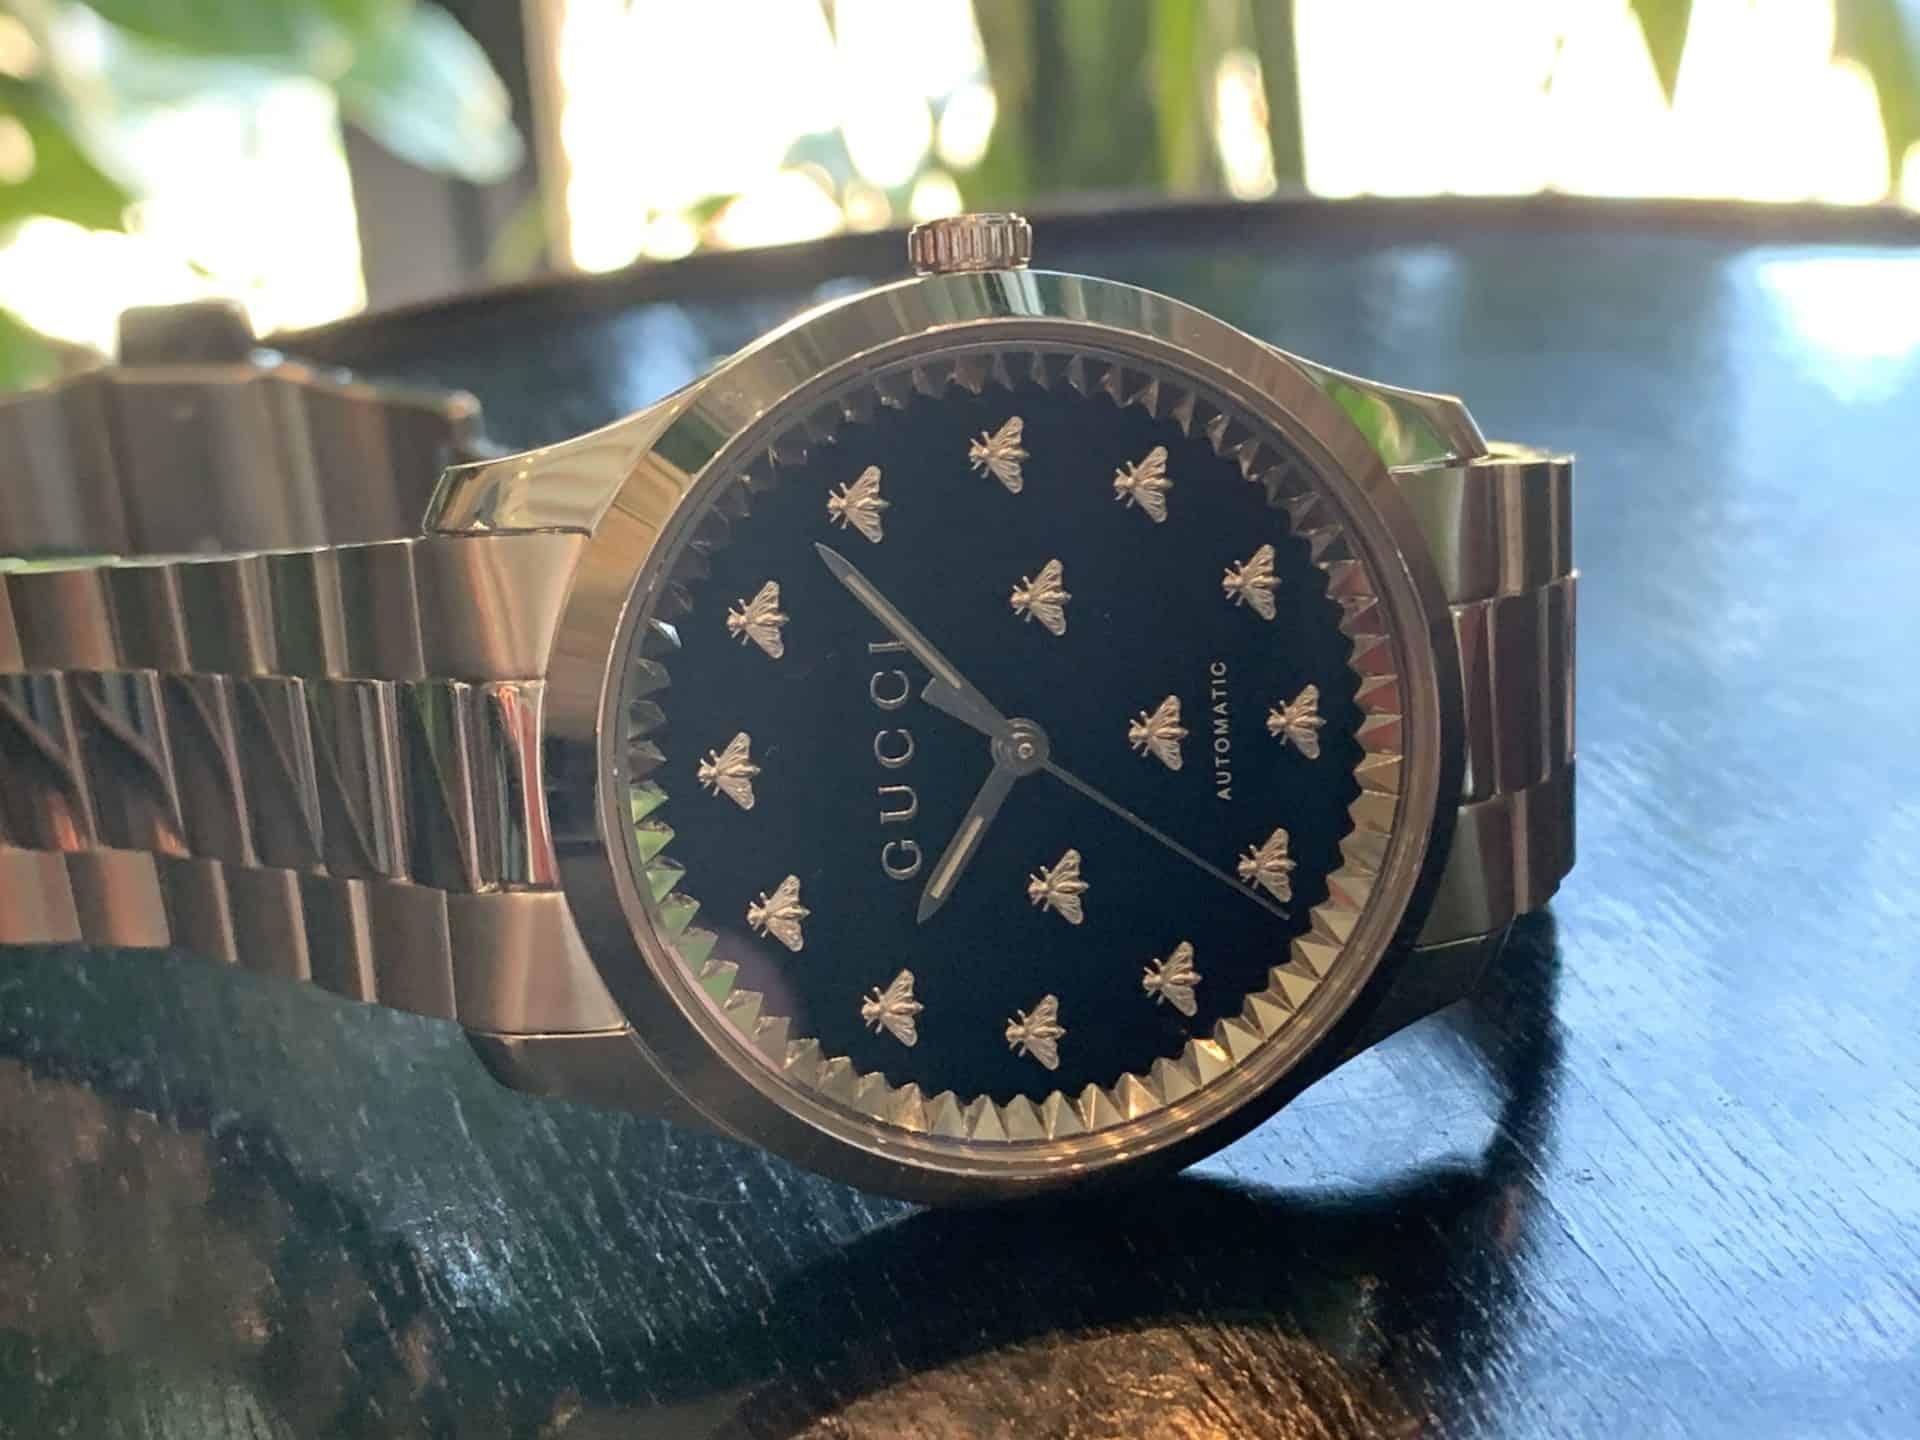 Gucci G Timeless Automatic Edelstahl Referenz YA126283 2 kl 1